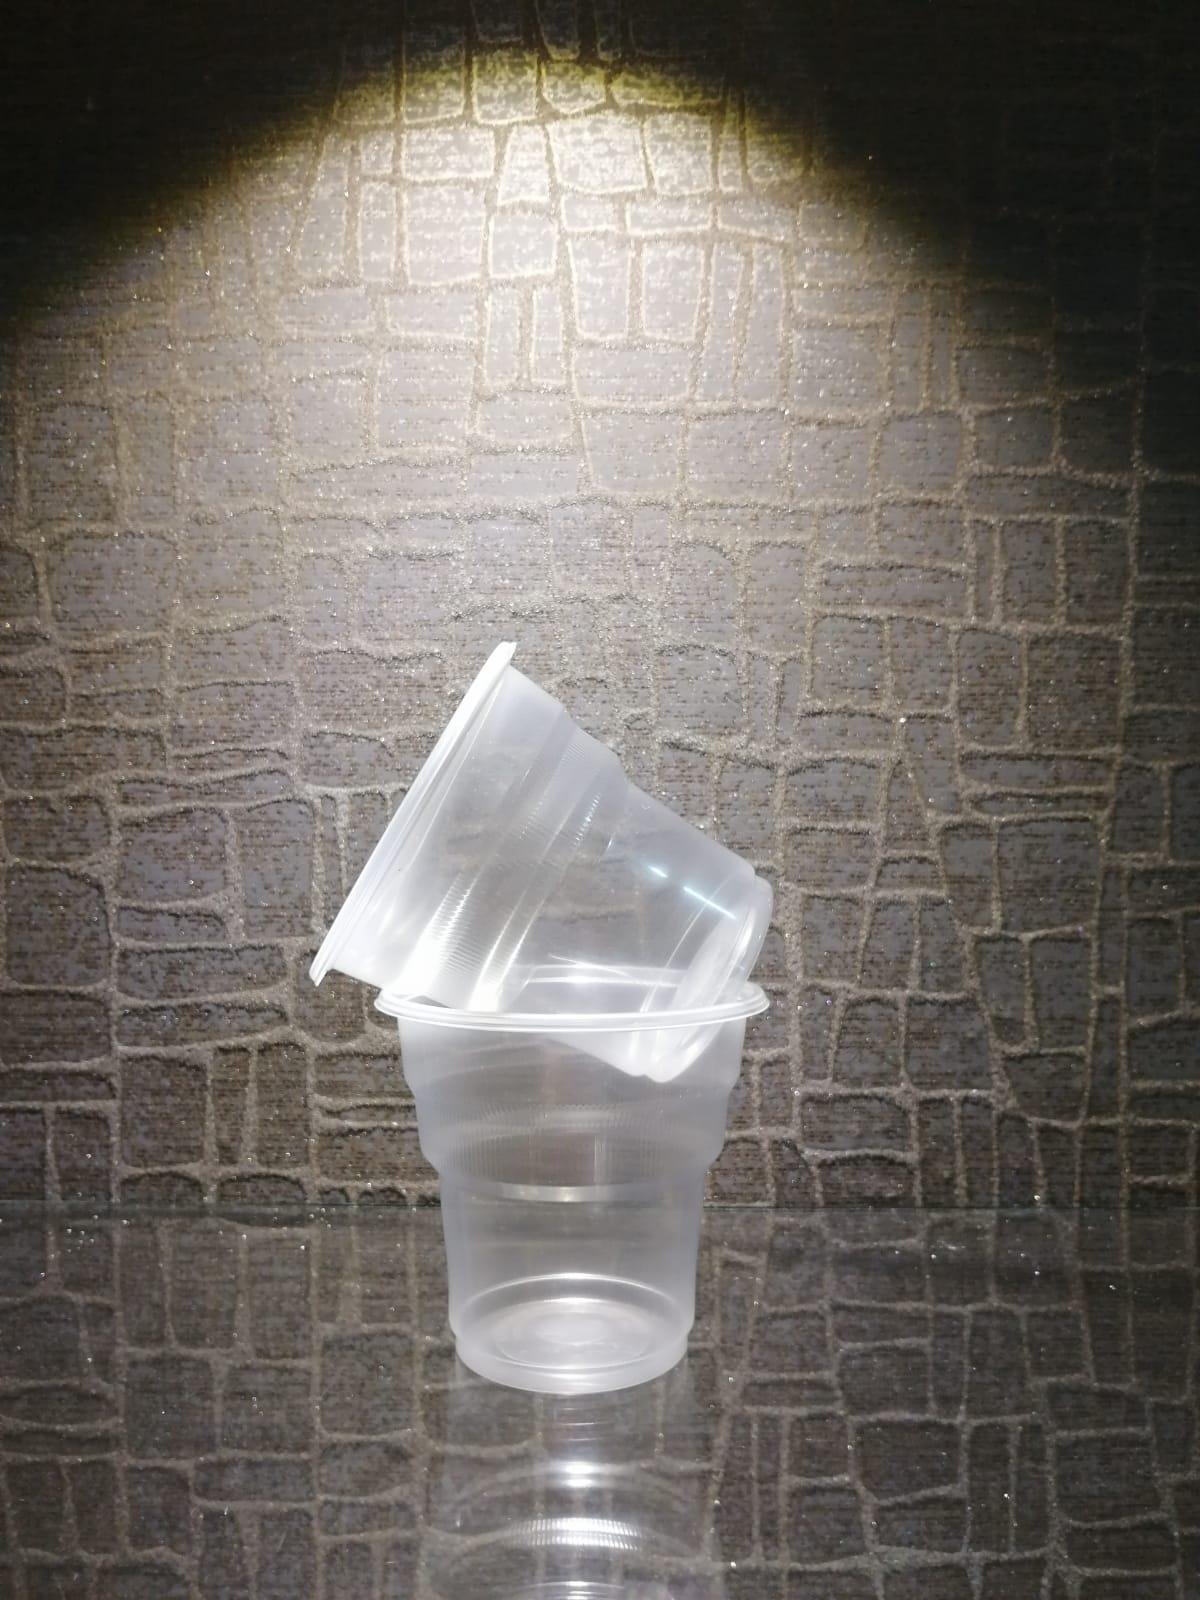 75/160 pp plastic cup